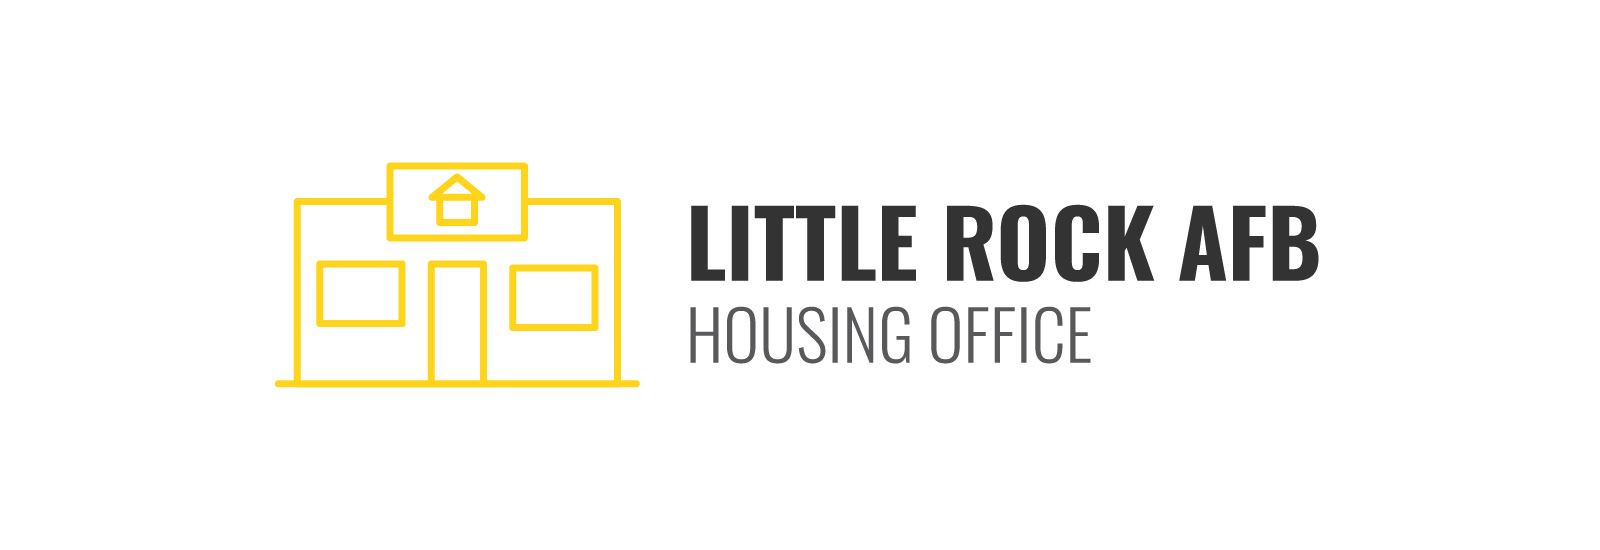 Little Rock AFB Housing Office